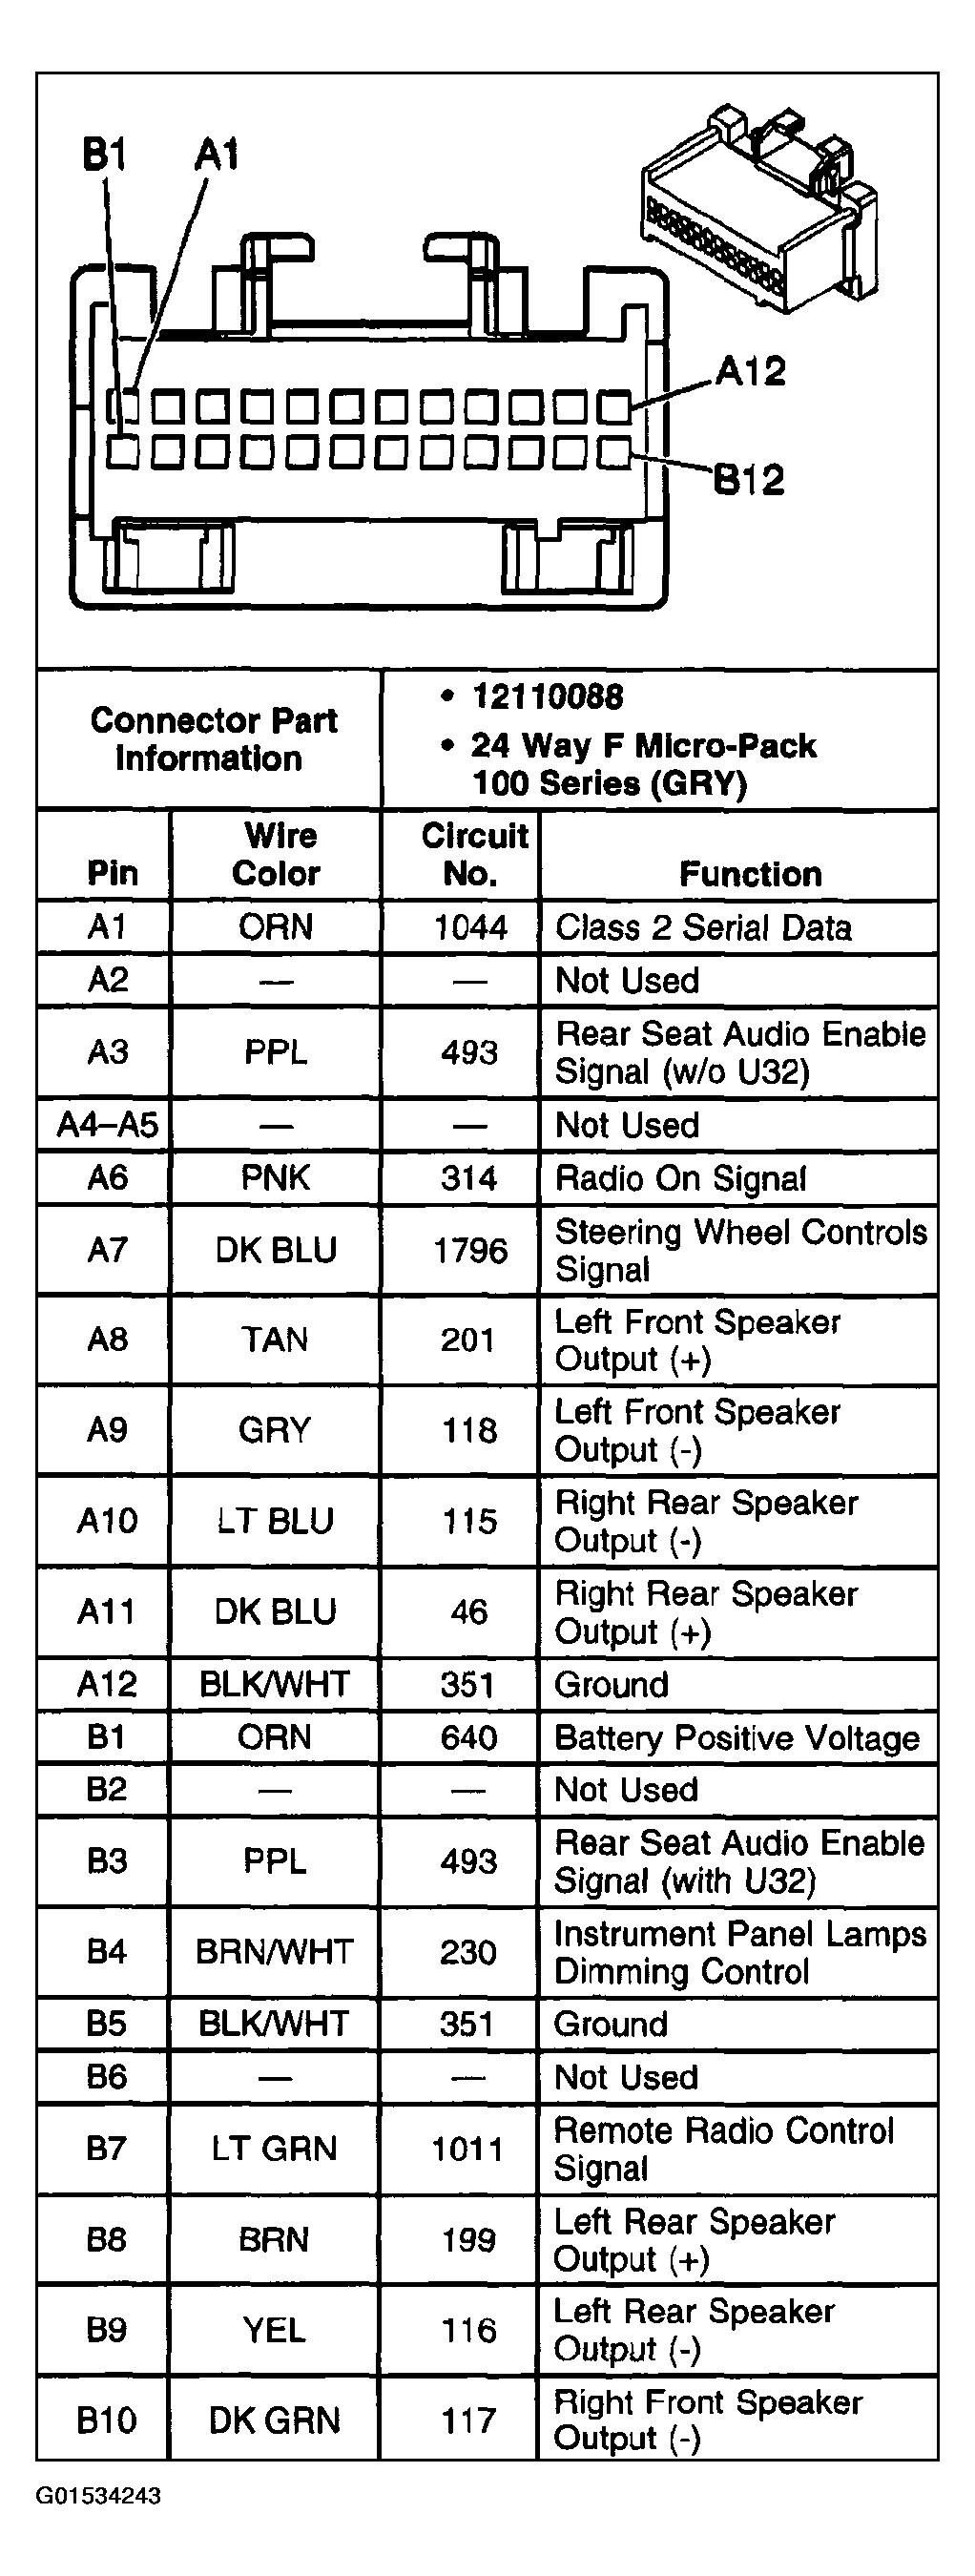 2005 chevy trailblazer stereo wiring diagram unique 7 2002 chevy trailblazer stereo wiring harness motor at 2004 of 2005 chevy trailblazer stereo wiring diagram